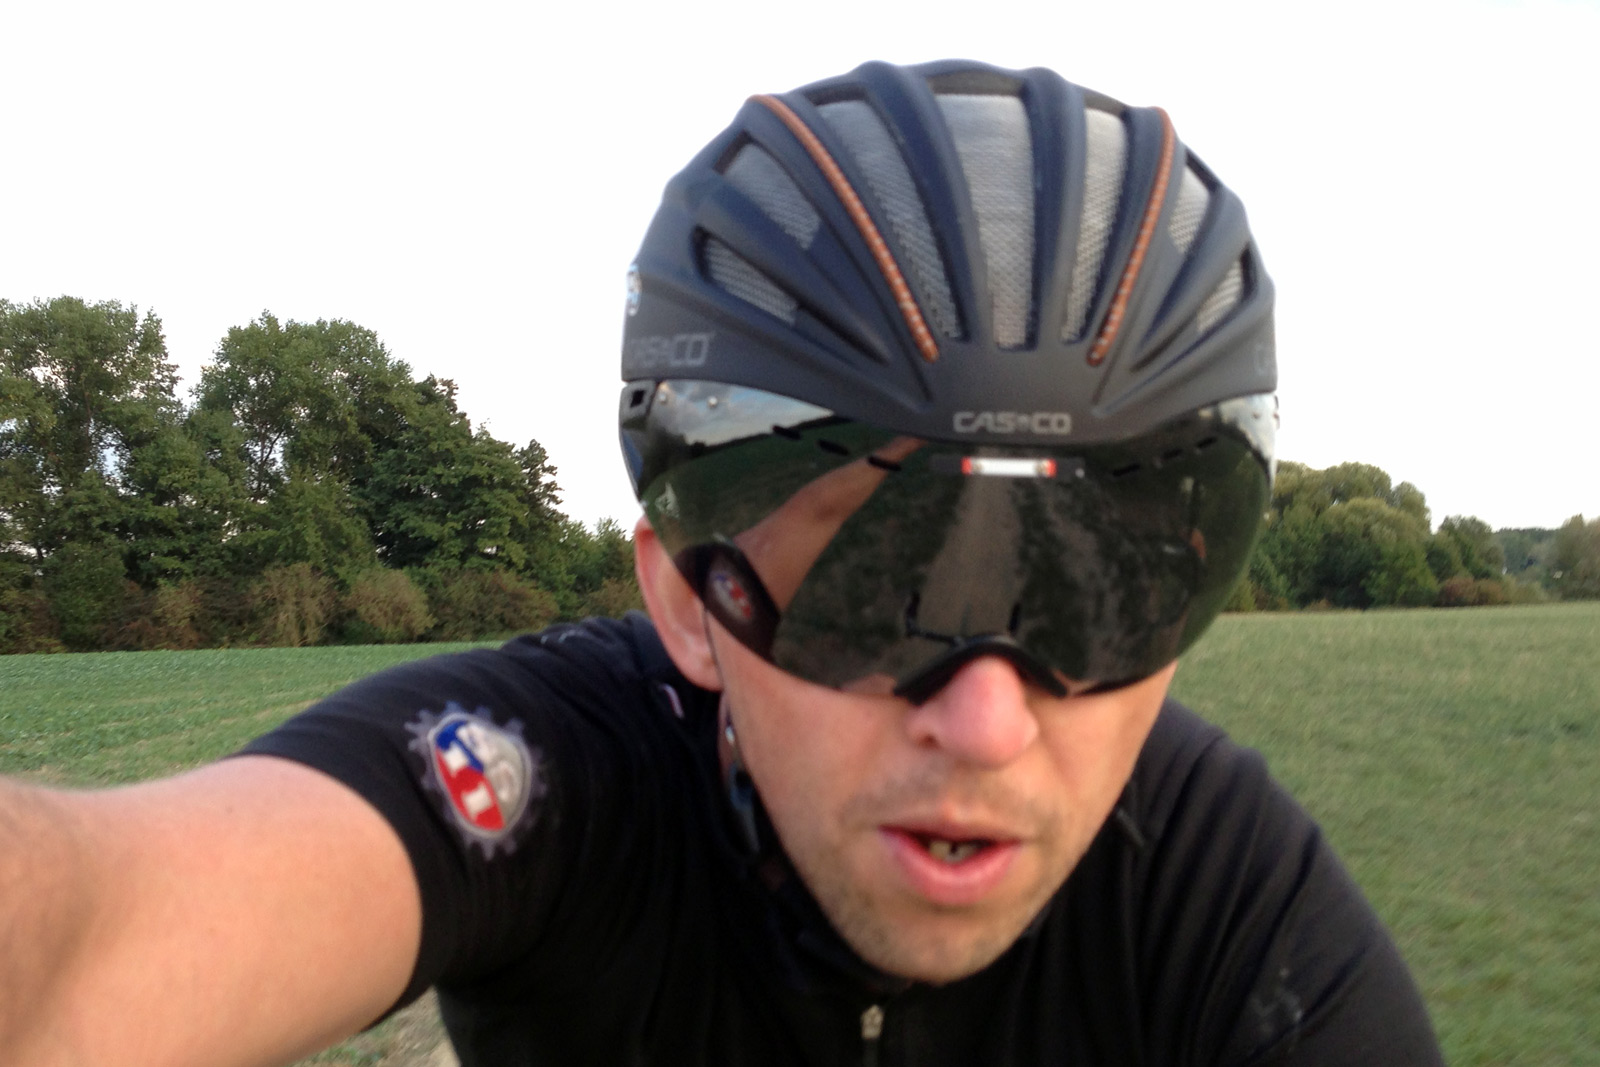 Casco_Speed-Airo-TCS-aero-road-helmet_trail-selfie